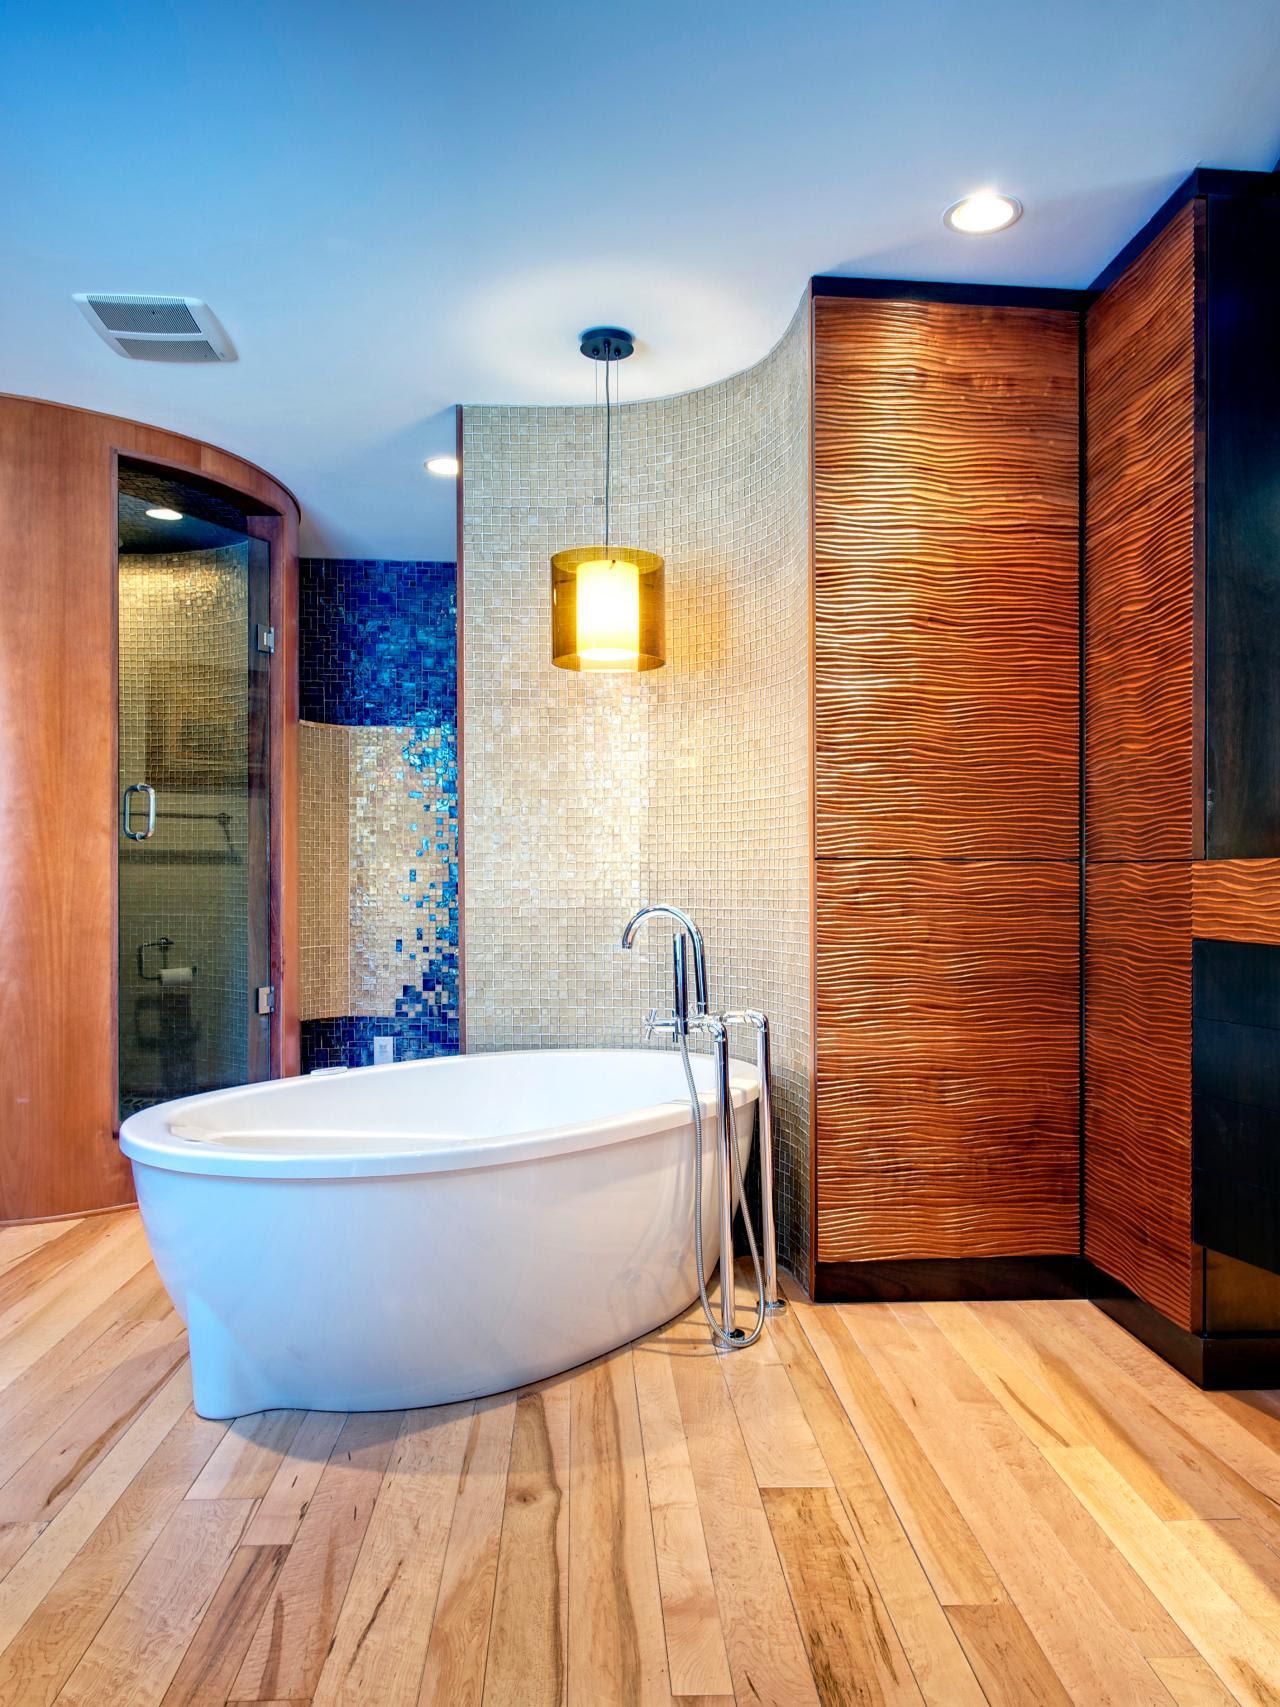 Wtsenates Enchanting Bathroom Design Freestanding Tub In Collection 6084